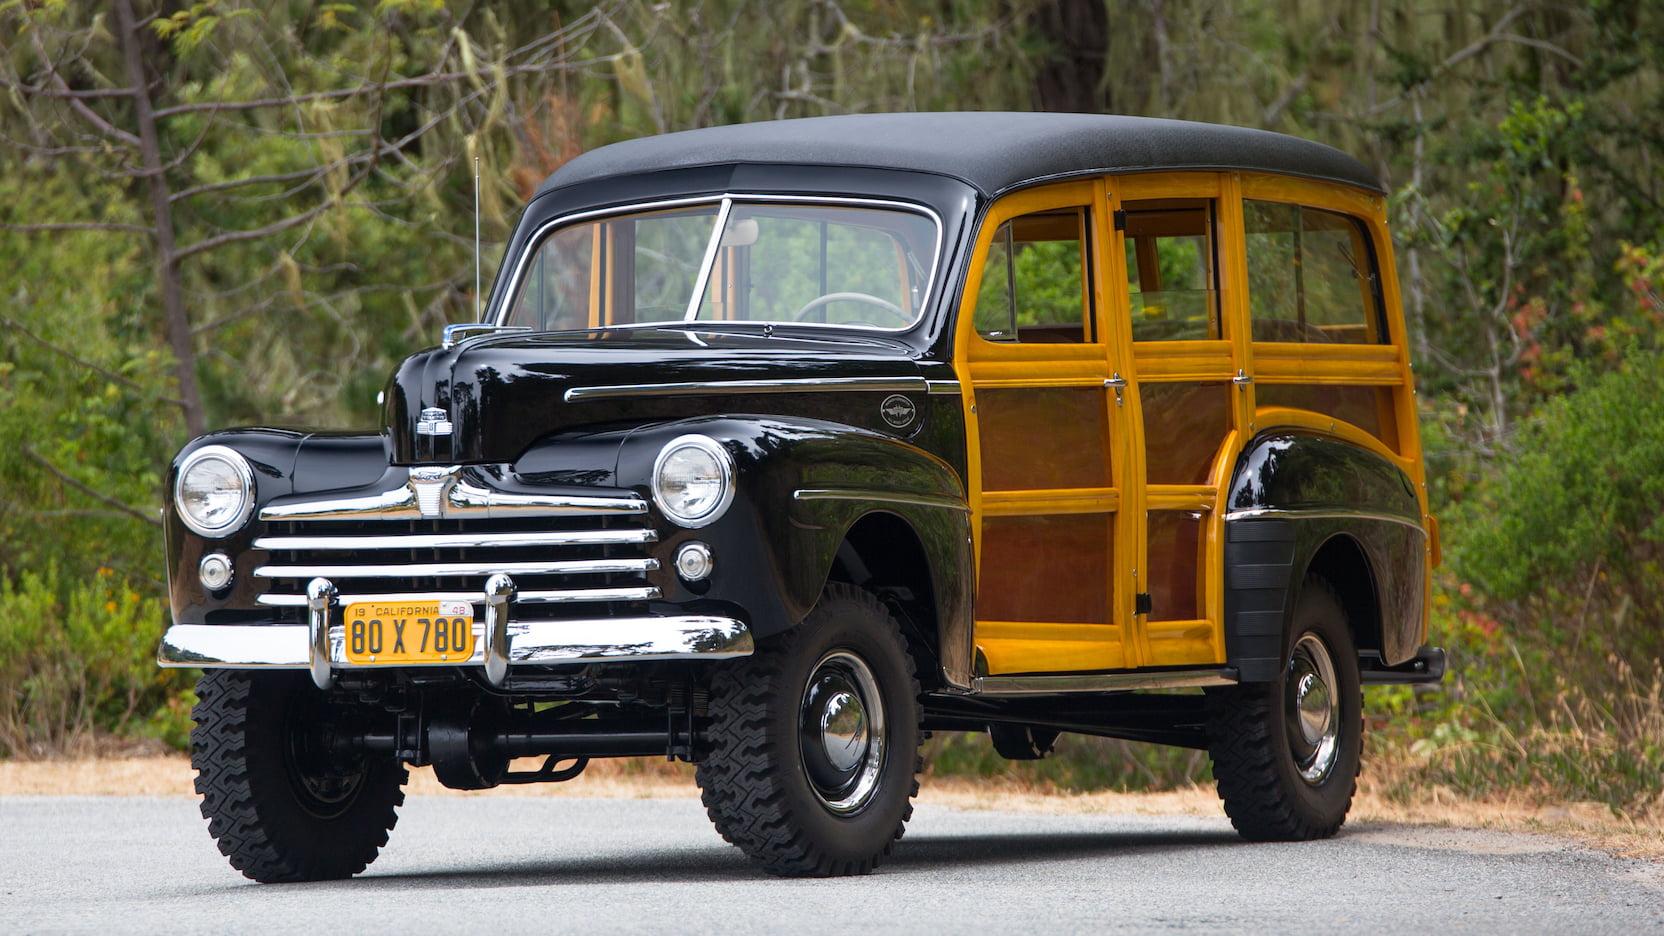 1948 Ford Super Deluxe Marmon - Herrington Woody Wagon